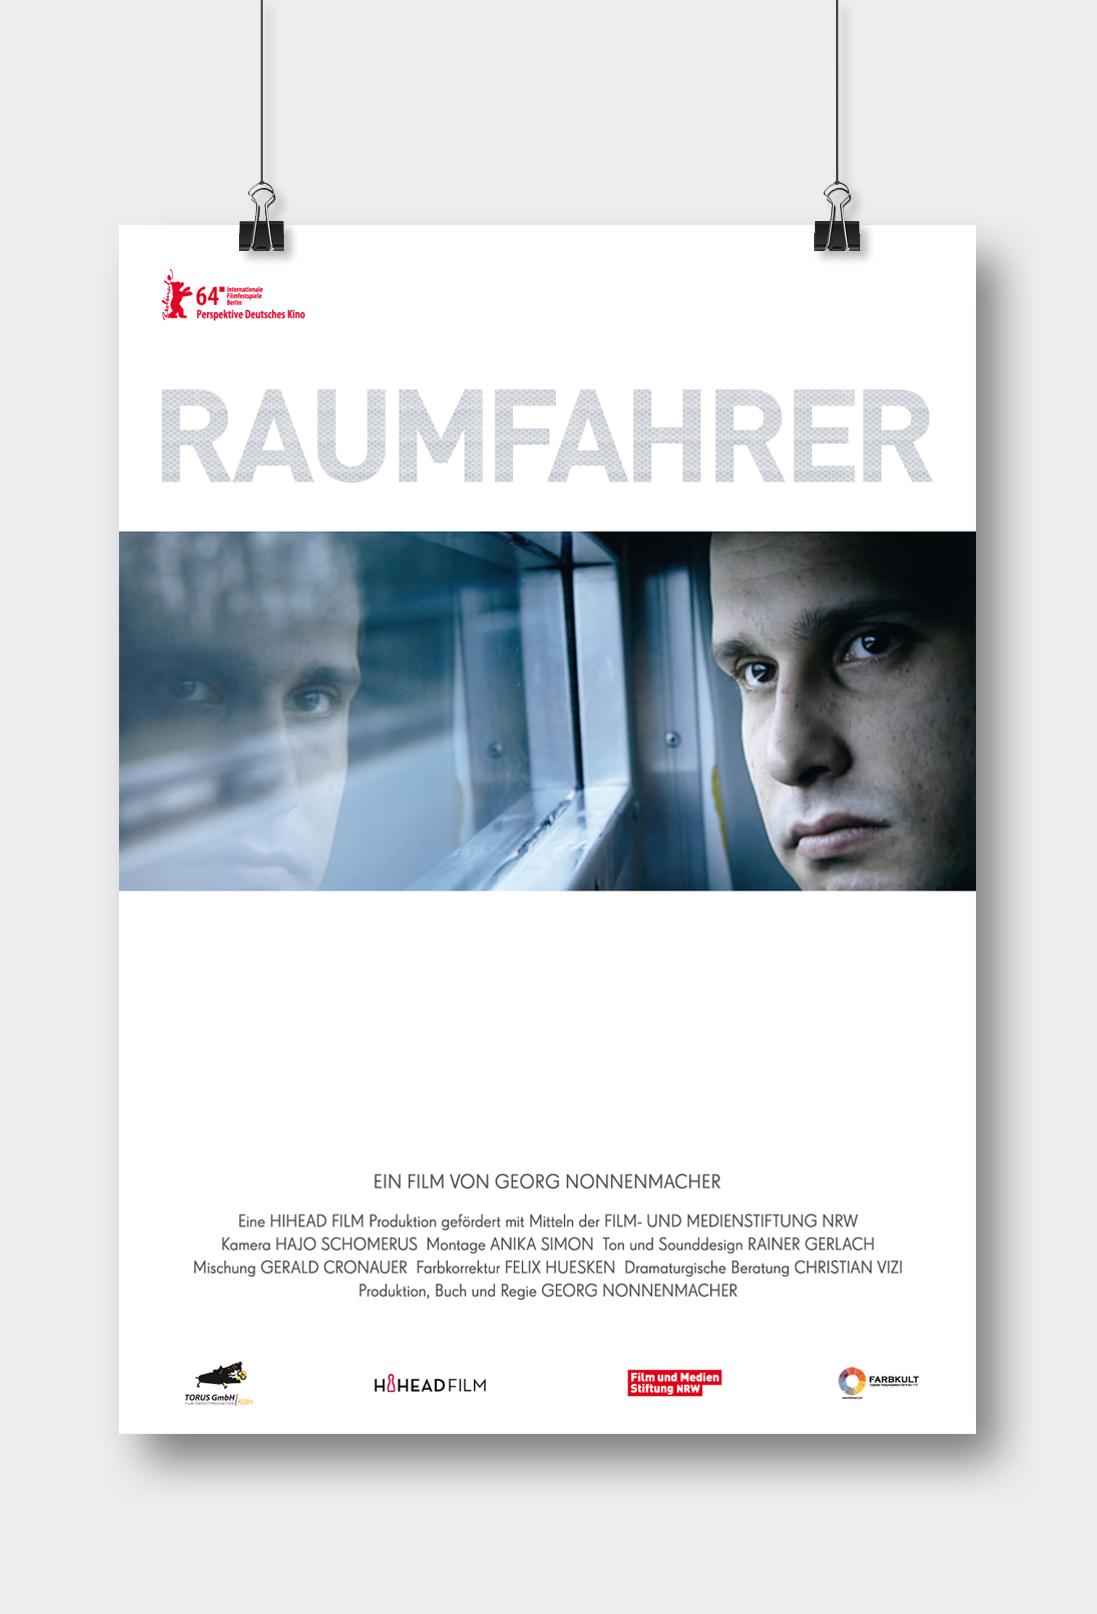 Raumfahrer – movie poster